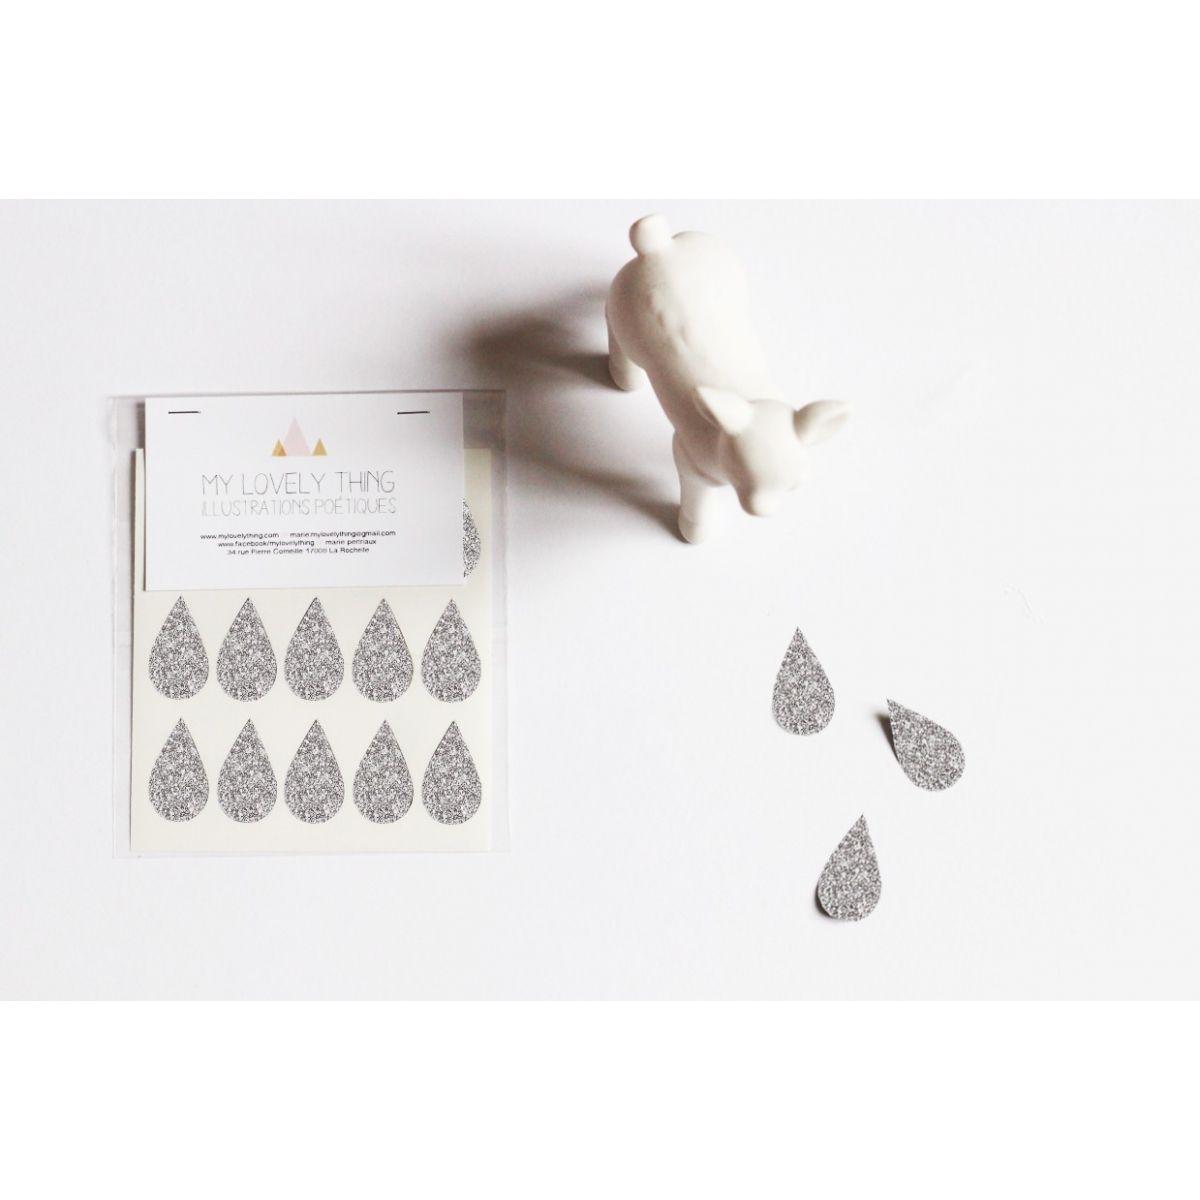 Naklejki Stickers Drop silver kropla srebrna - My Lovely Thing